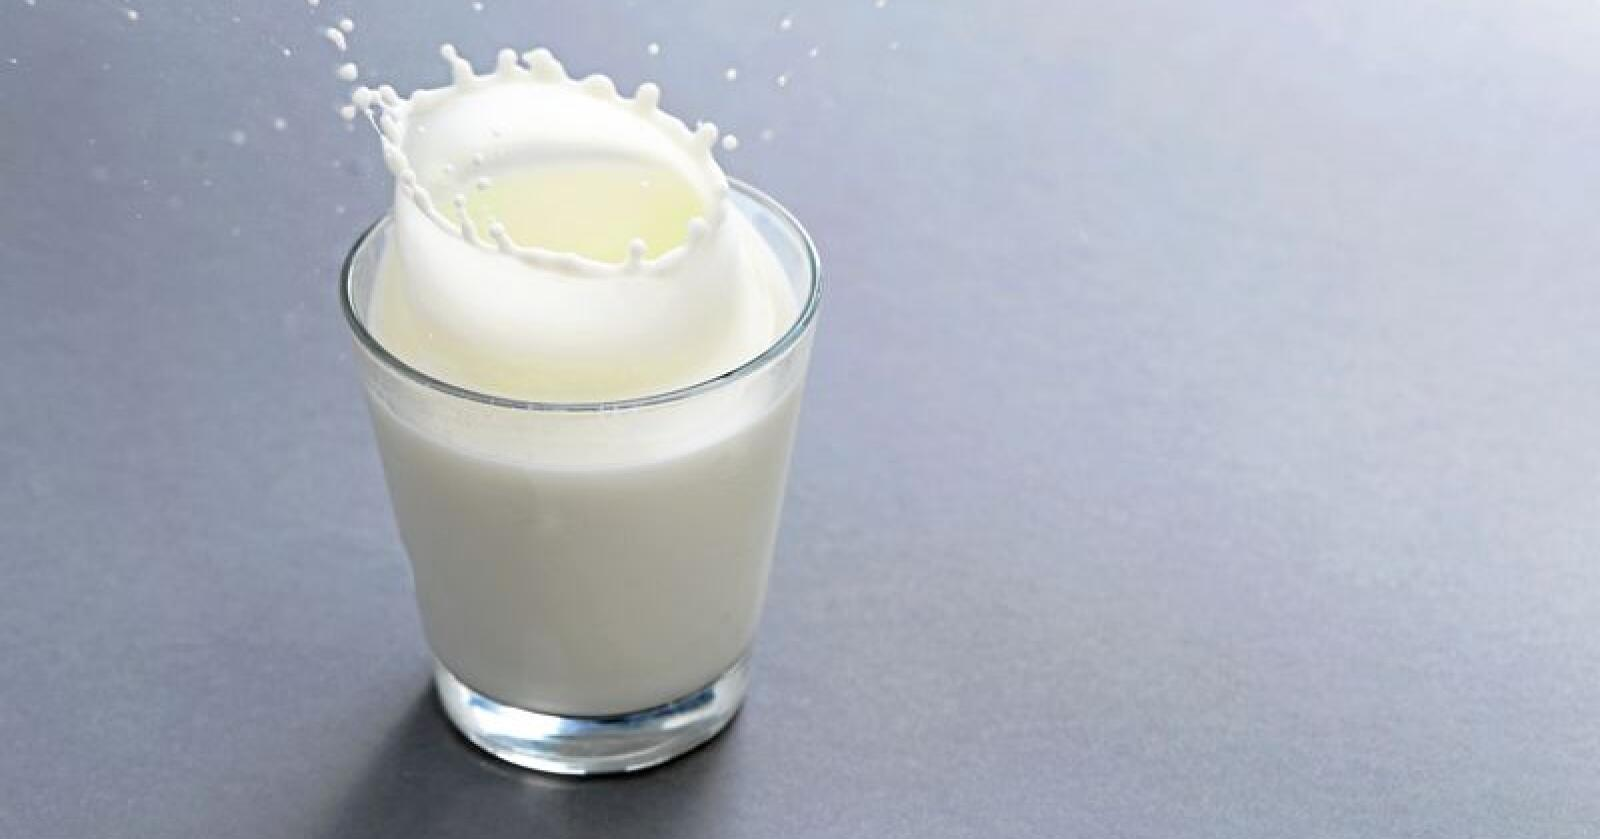 Det blir færre og færre melkeglass til frokosten i de norske hjem. Foto Colourbox